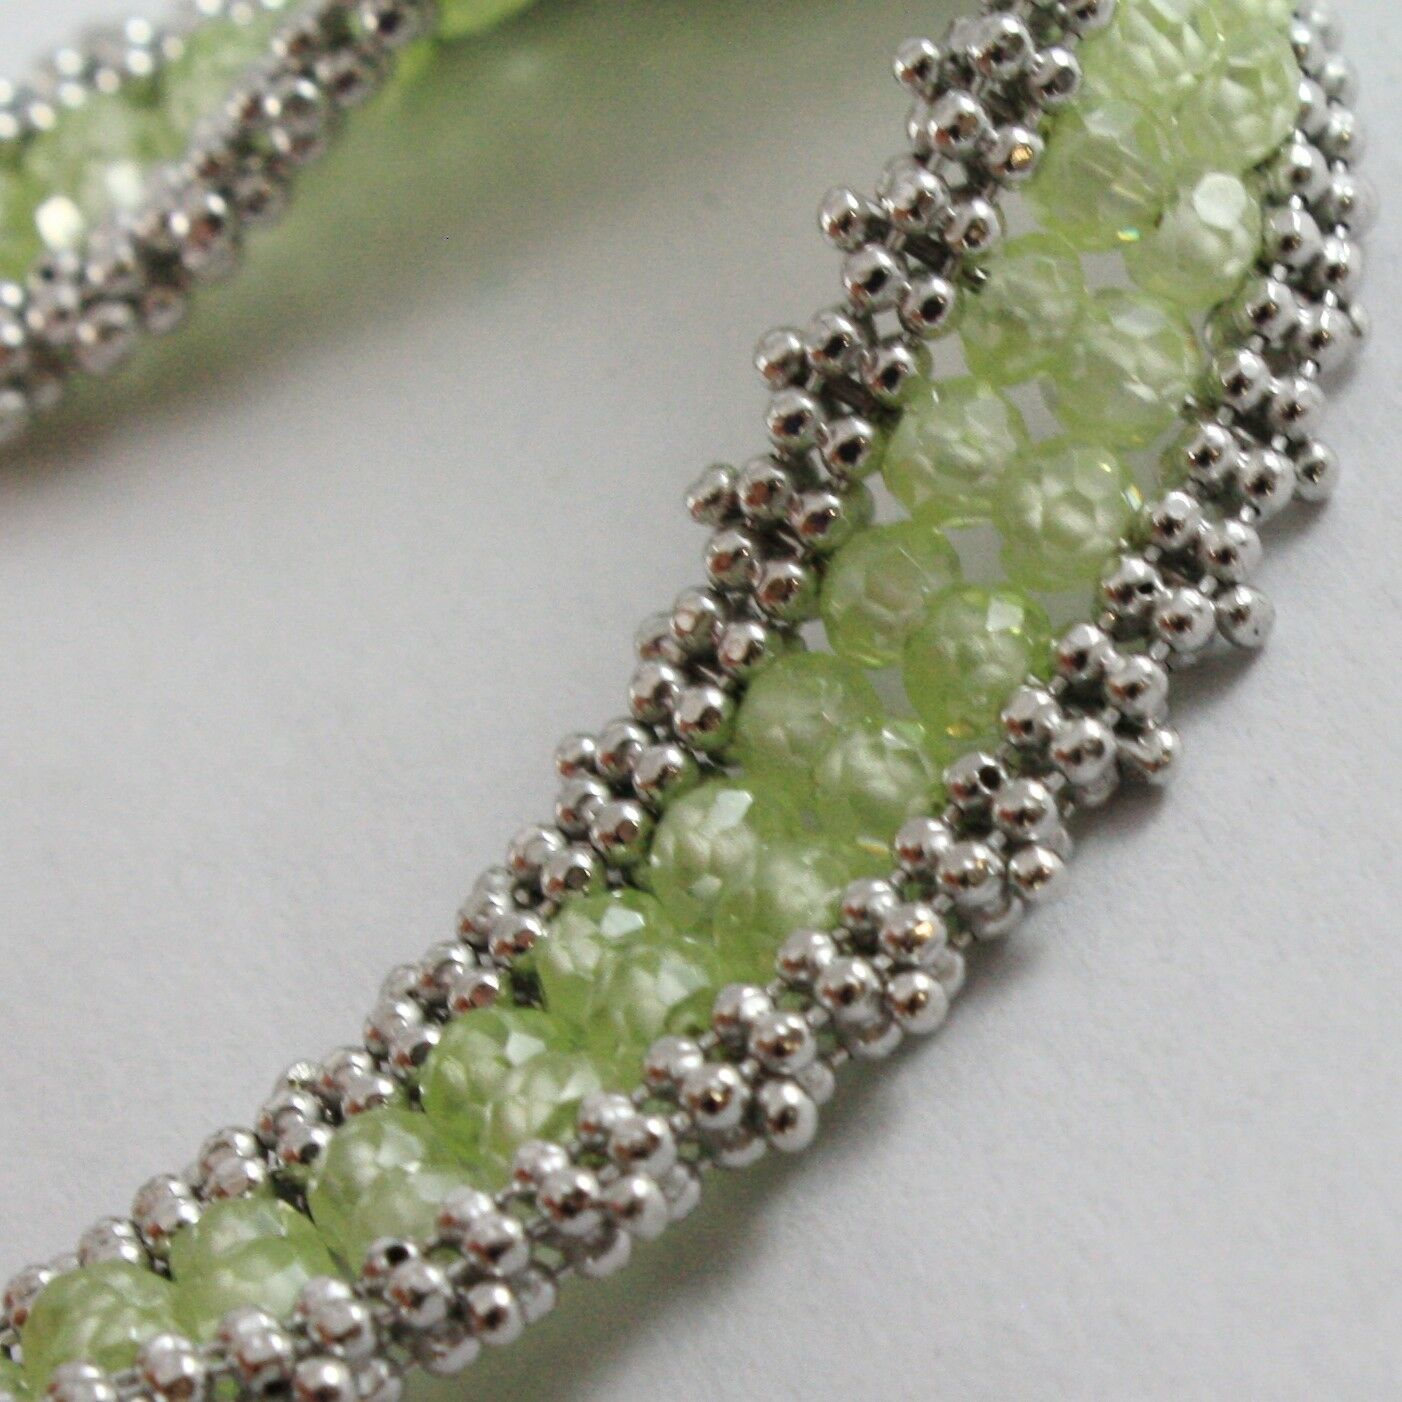 Armband Silber 925, Tennis Kugeln Multi Reihen, Peridot Grün, Made in Italien